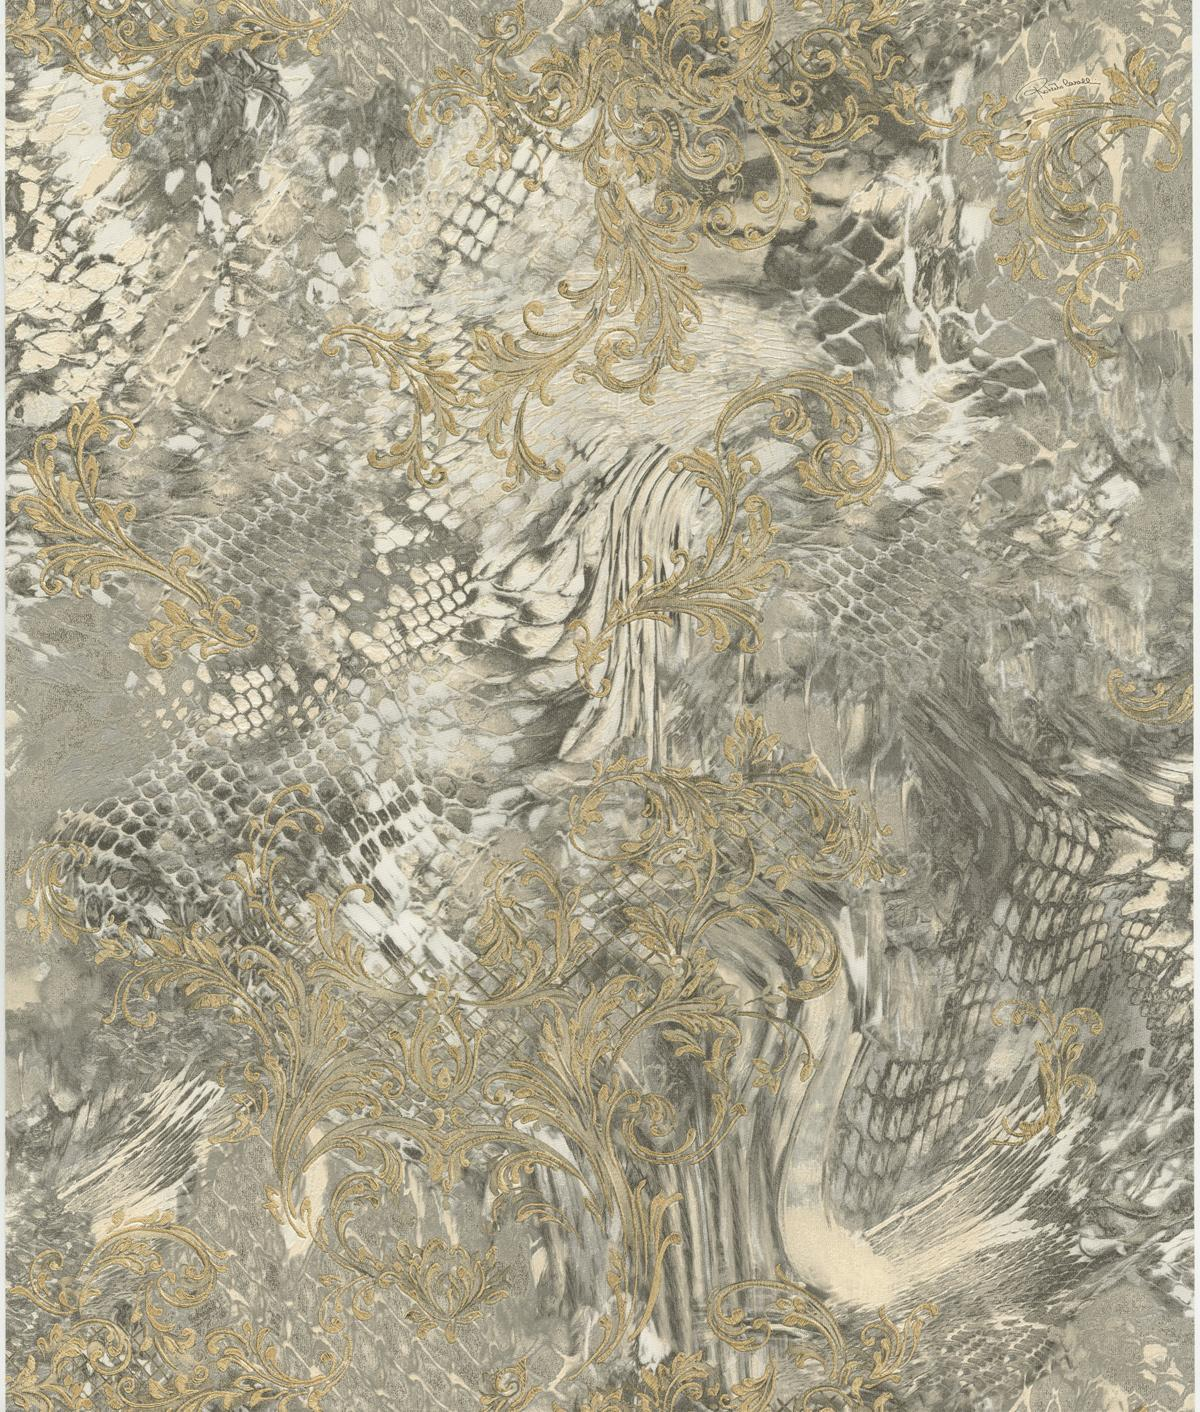 Roberto Cavalli RC14074 Claudia Schiffer Wallpaper Volume 3 1200x1412